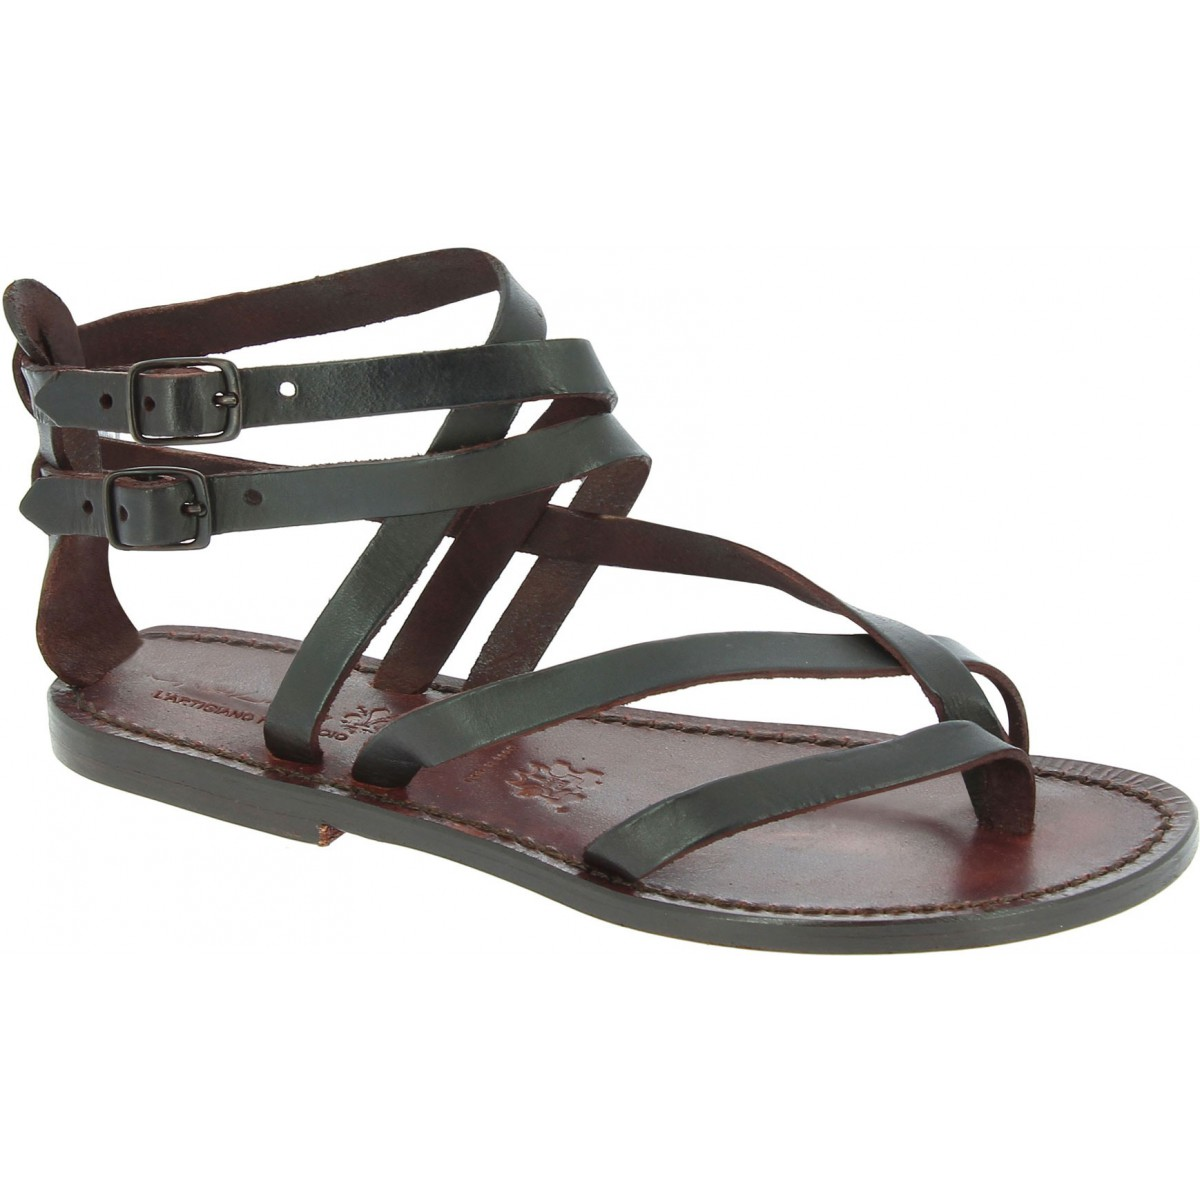 low priced 1a23d 83151 Flache Hand gefertigte Damen-Sandalen mit Riemchen aus dunkelbraunem Leder